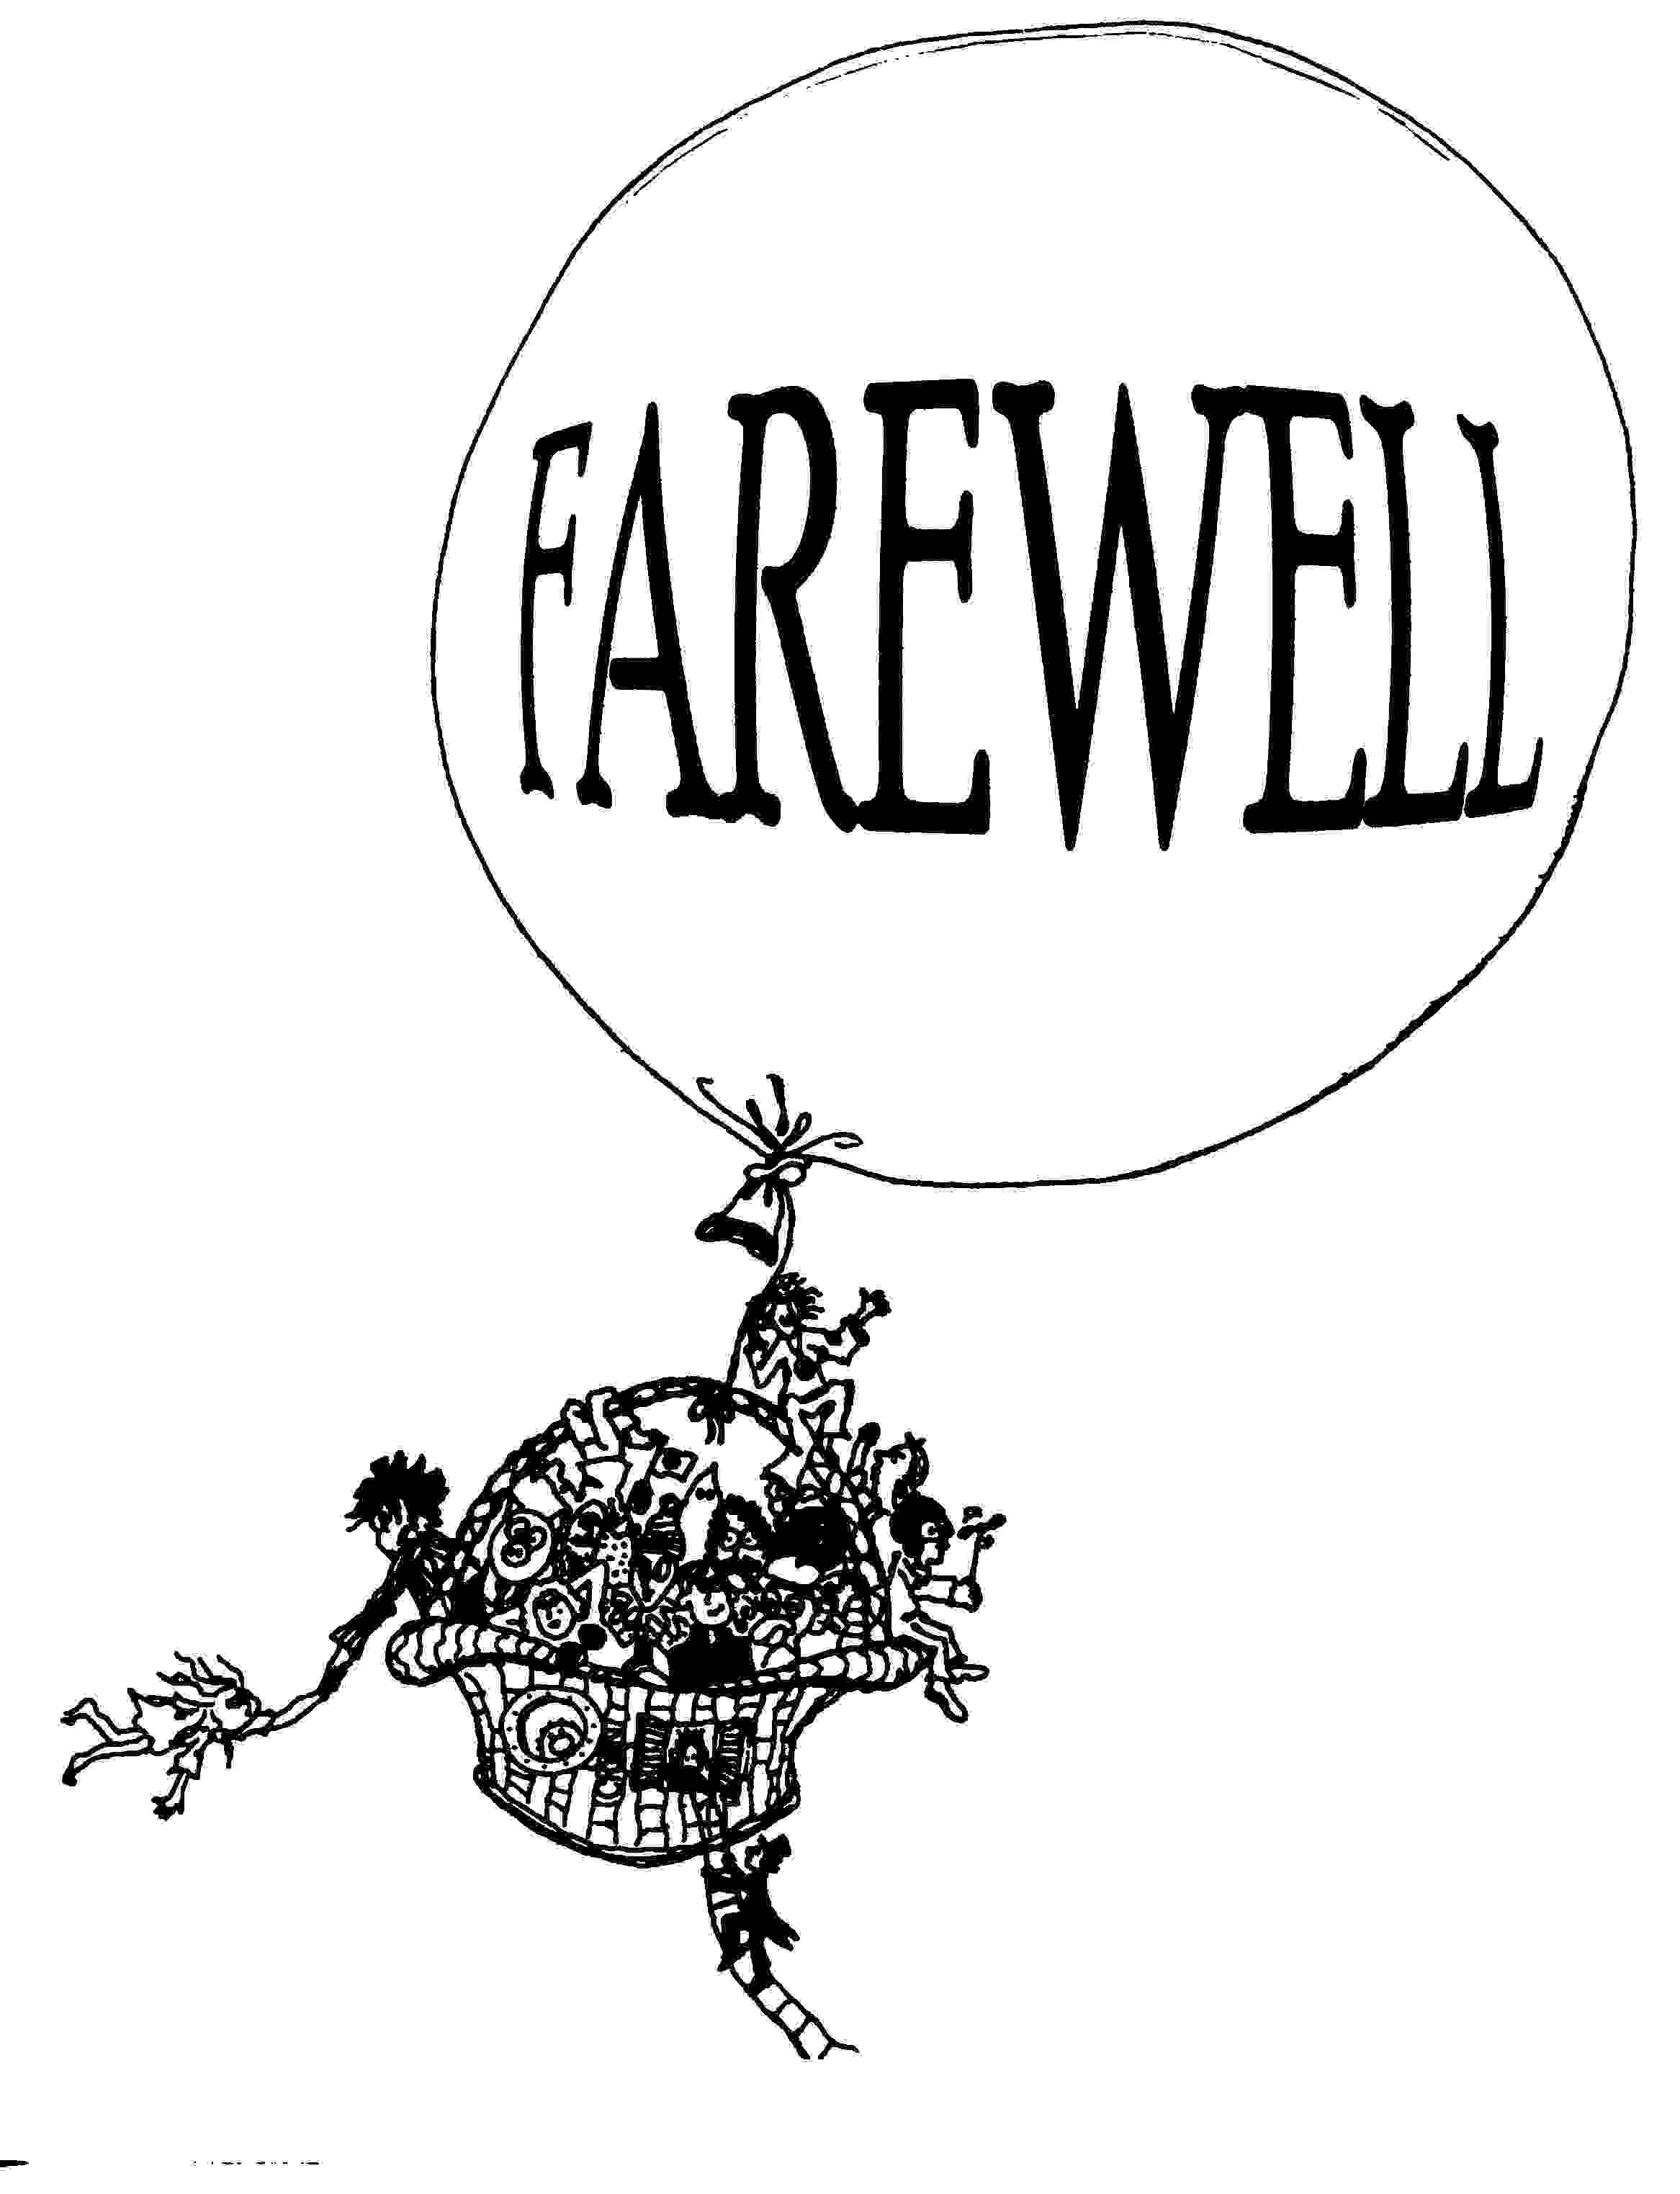 Free Goodbye Celebration Cliparts, Download Free Clip Art